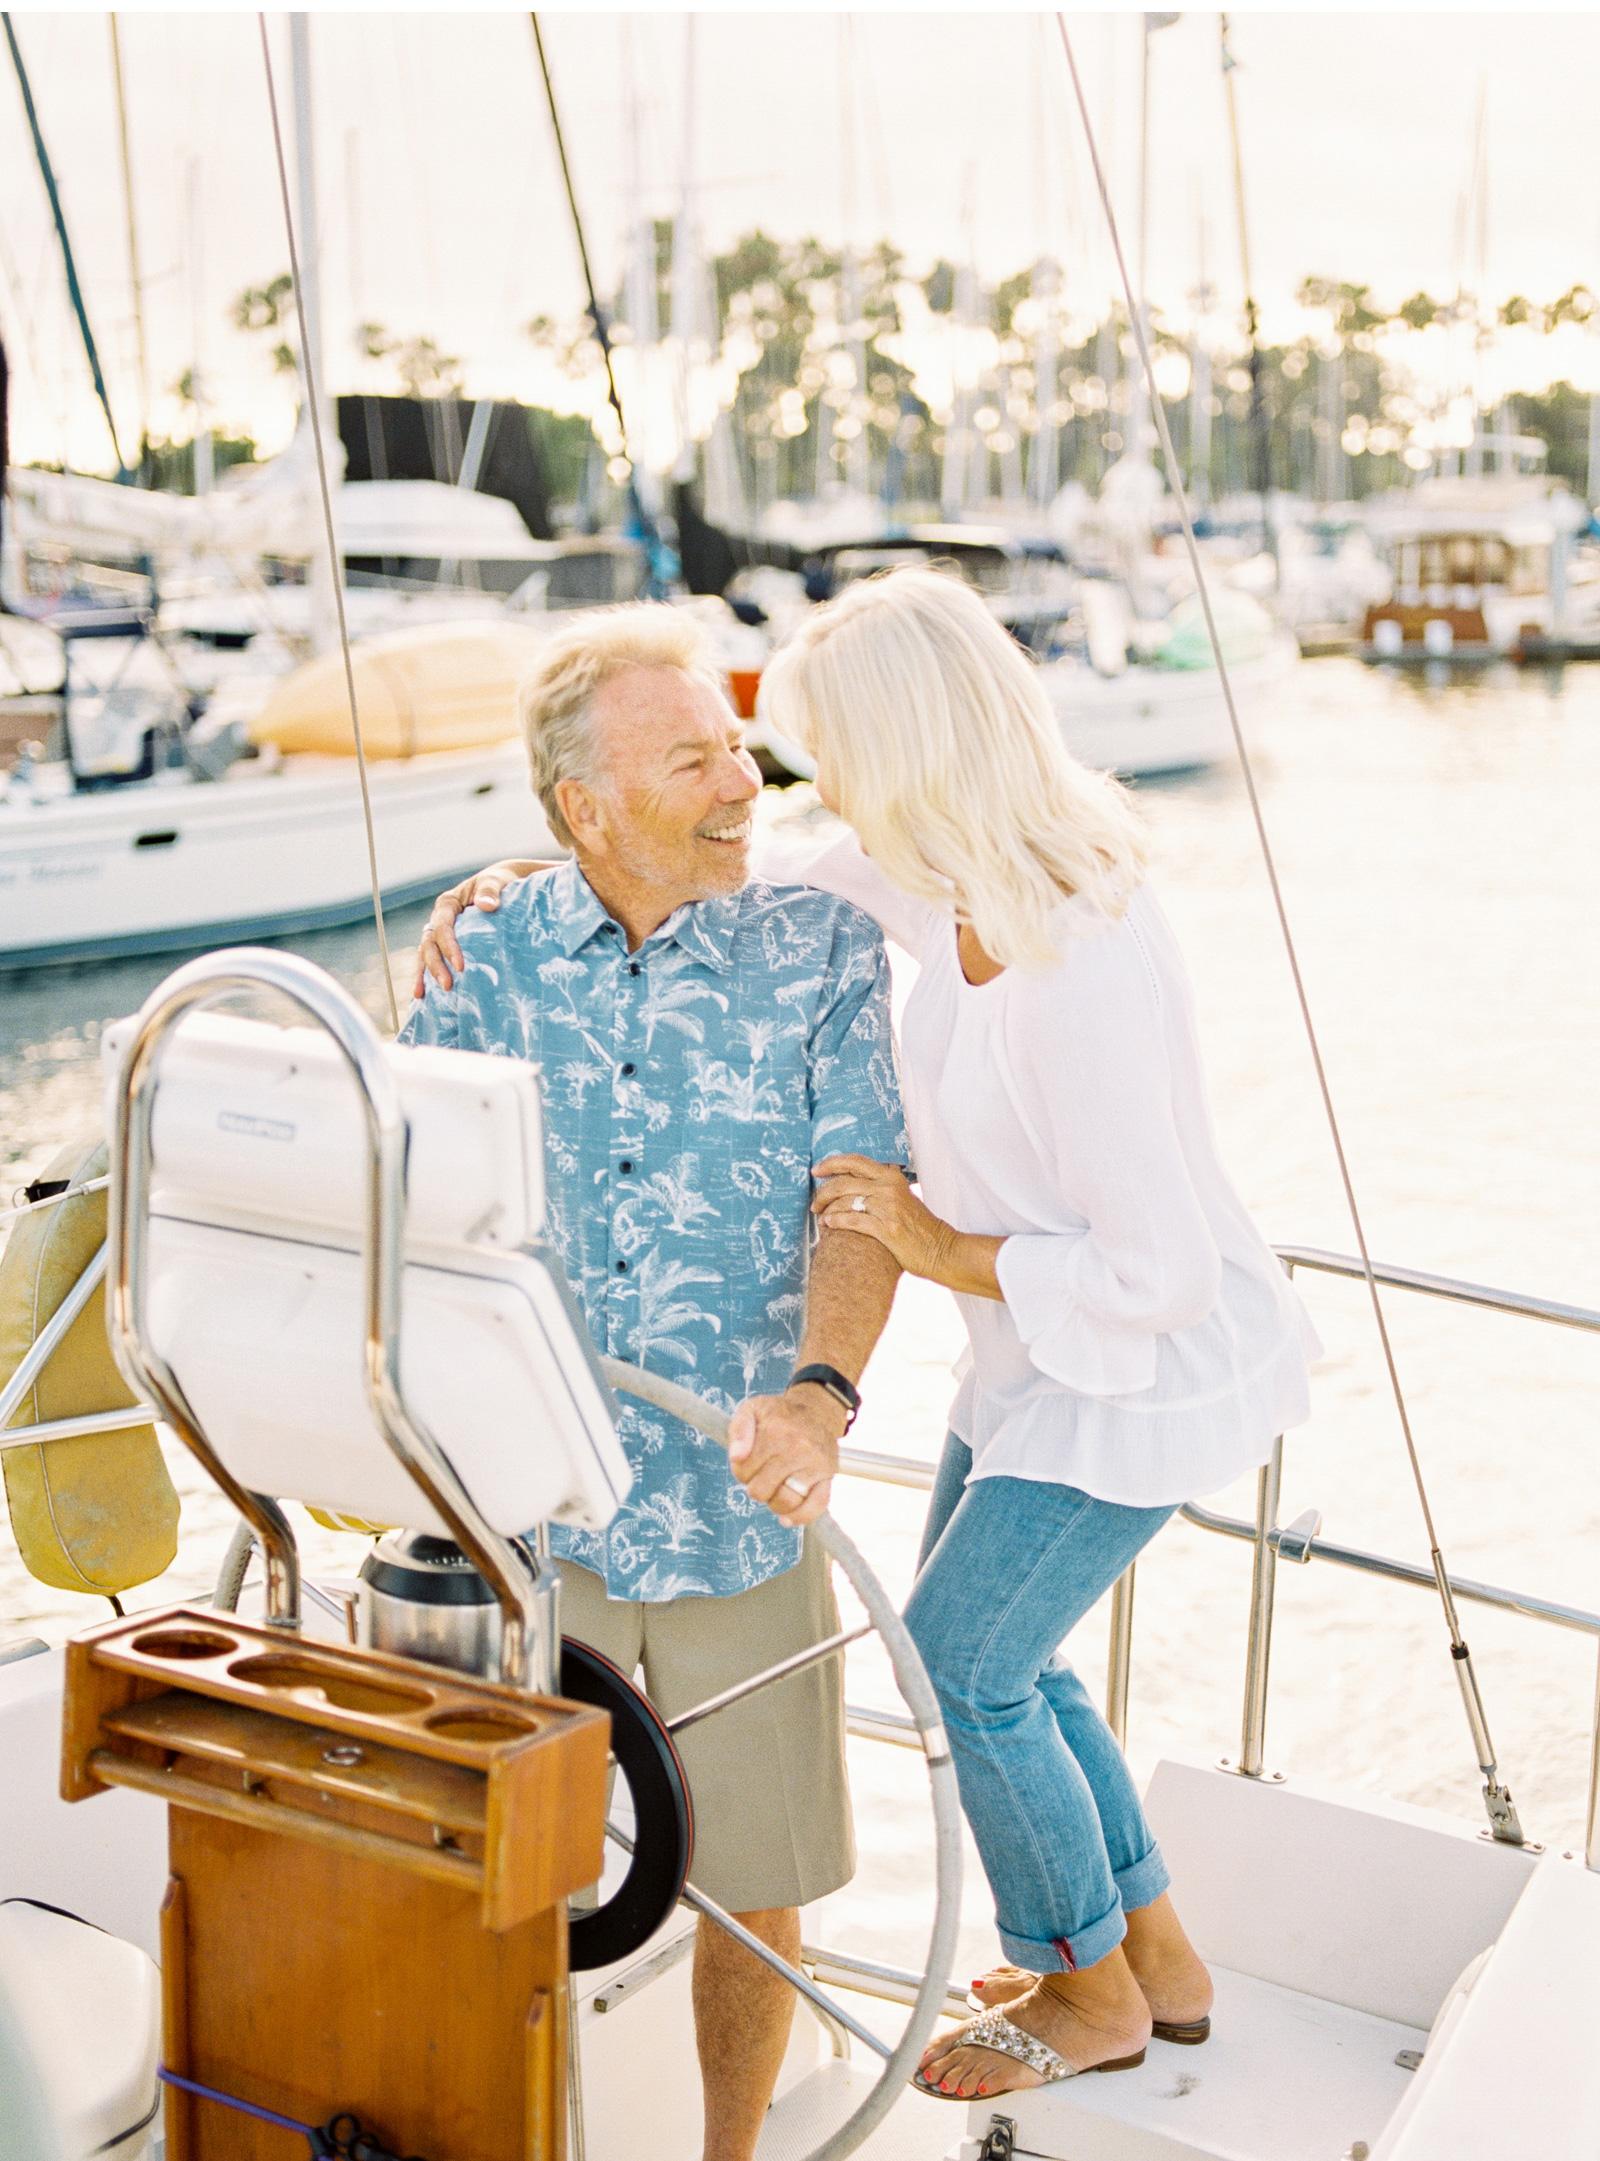 Anniversaries-on-the-Water-Long-Beach-Anniversary-Southern-California-Wedding-Photographer-Fine-Art-Wedding-Photos-Anniversary-on-Boat-Natalie-Schutt-Photography_14.jpg